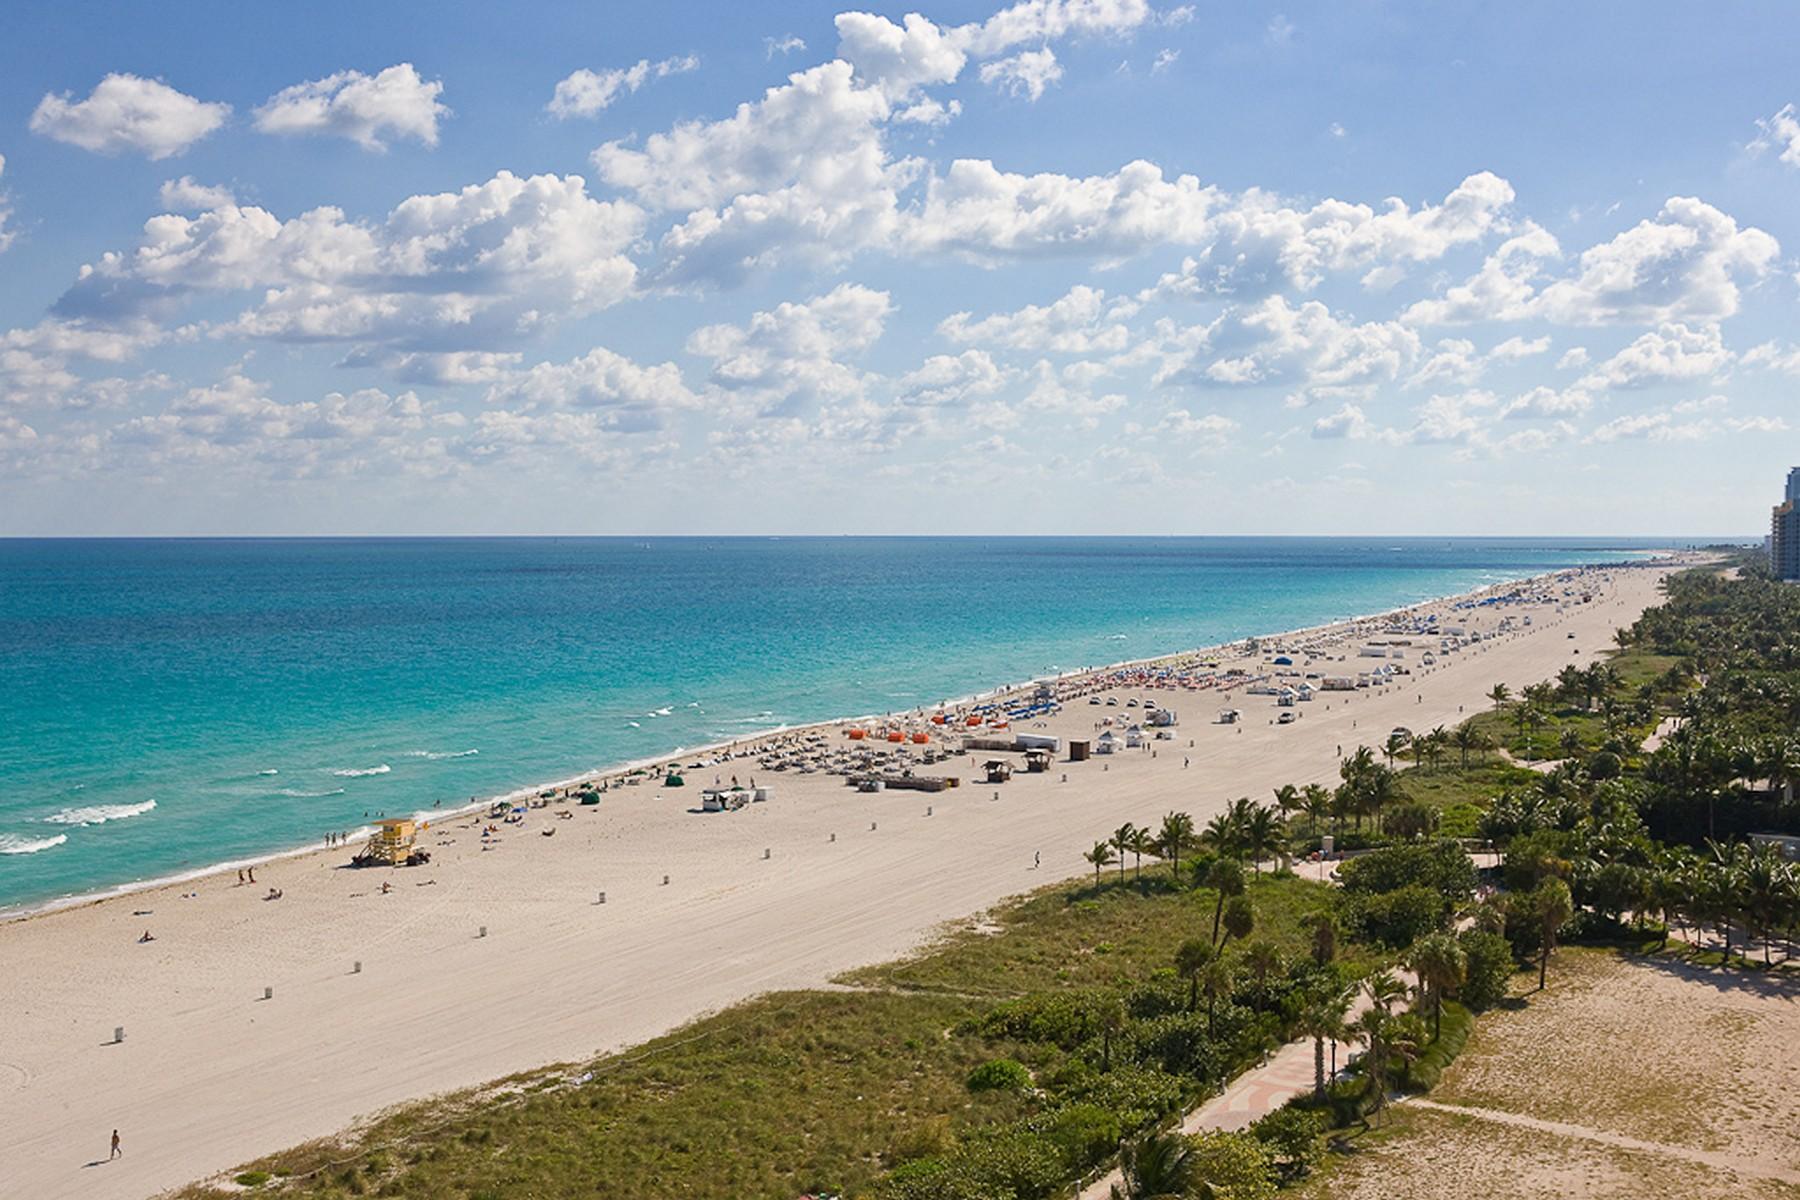 Condominium for Sale at W Hotel #1228/26 2201 Collins Ave 1228/2 Miami Beach, Florida, 33139 United States